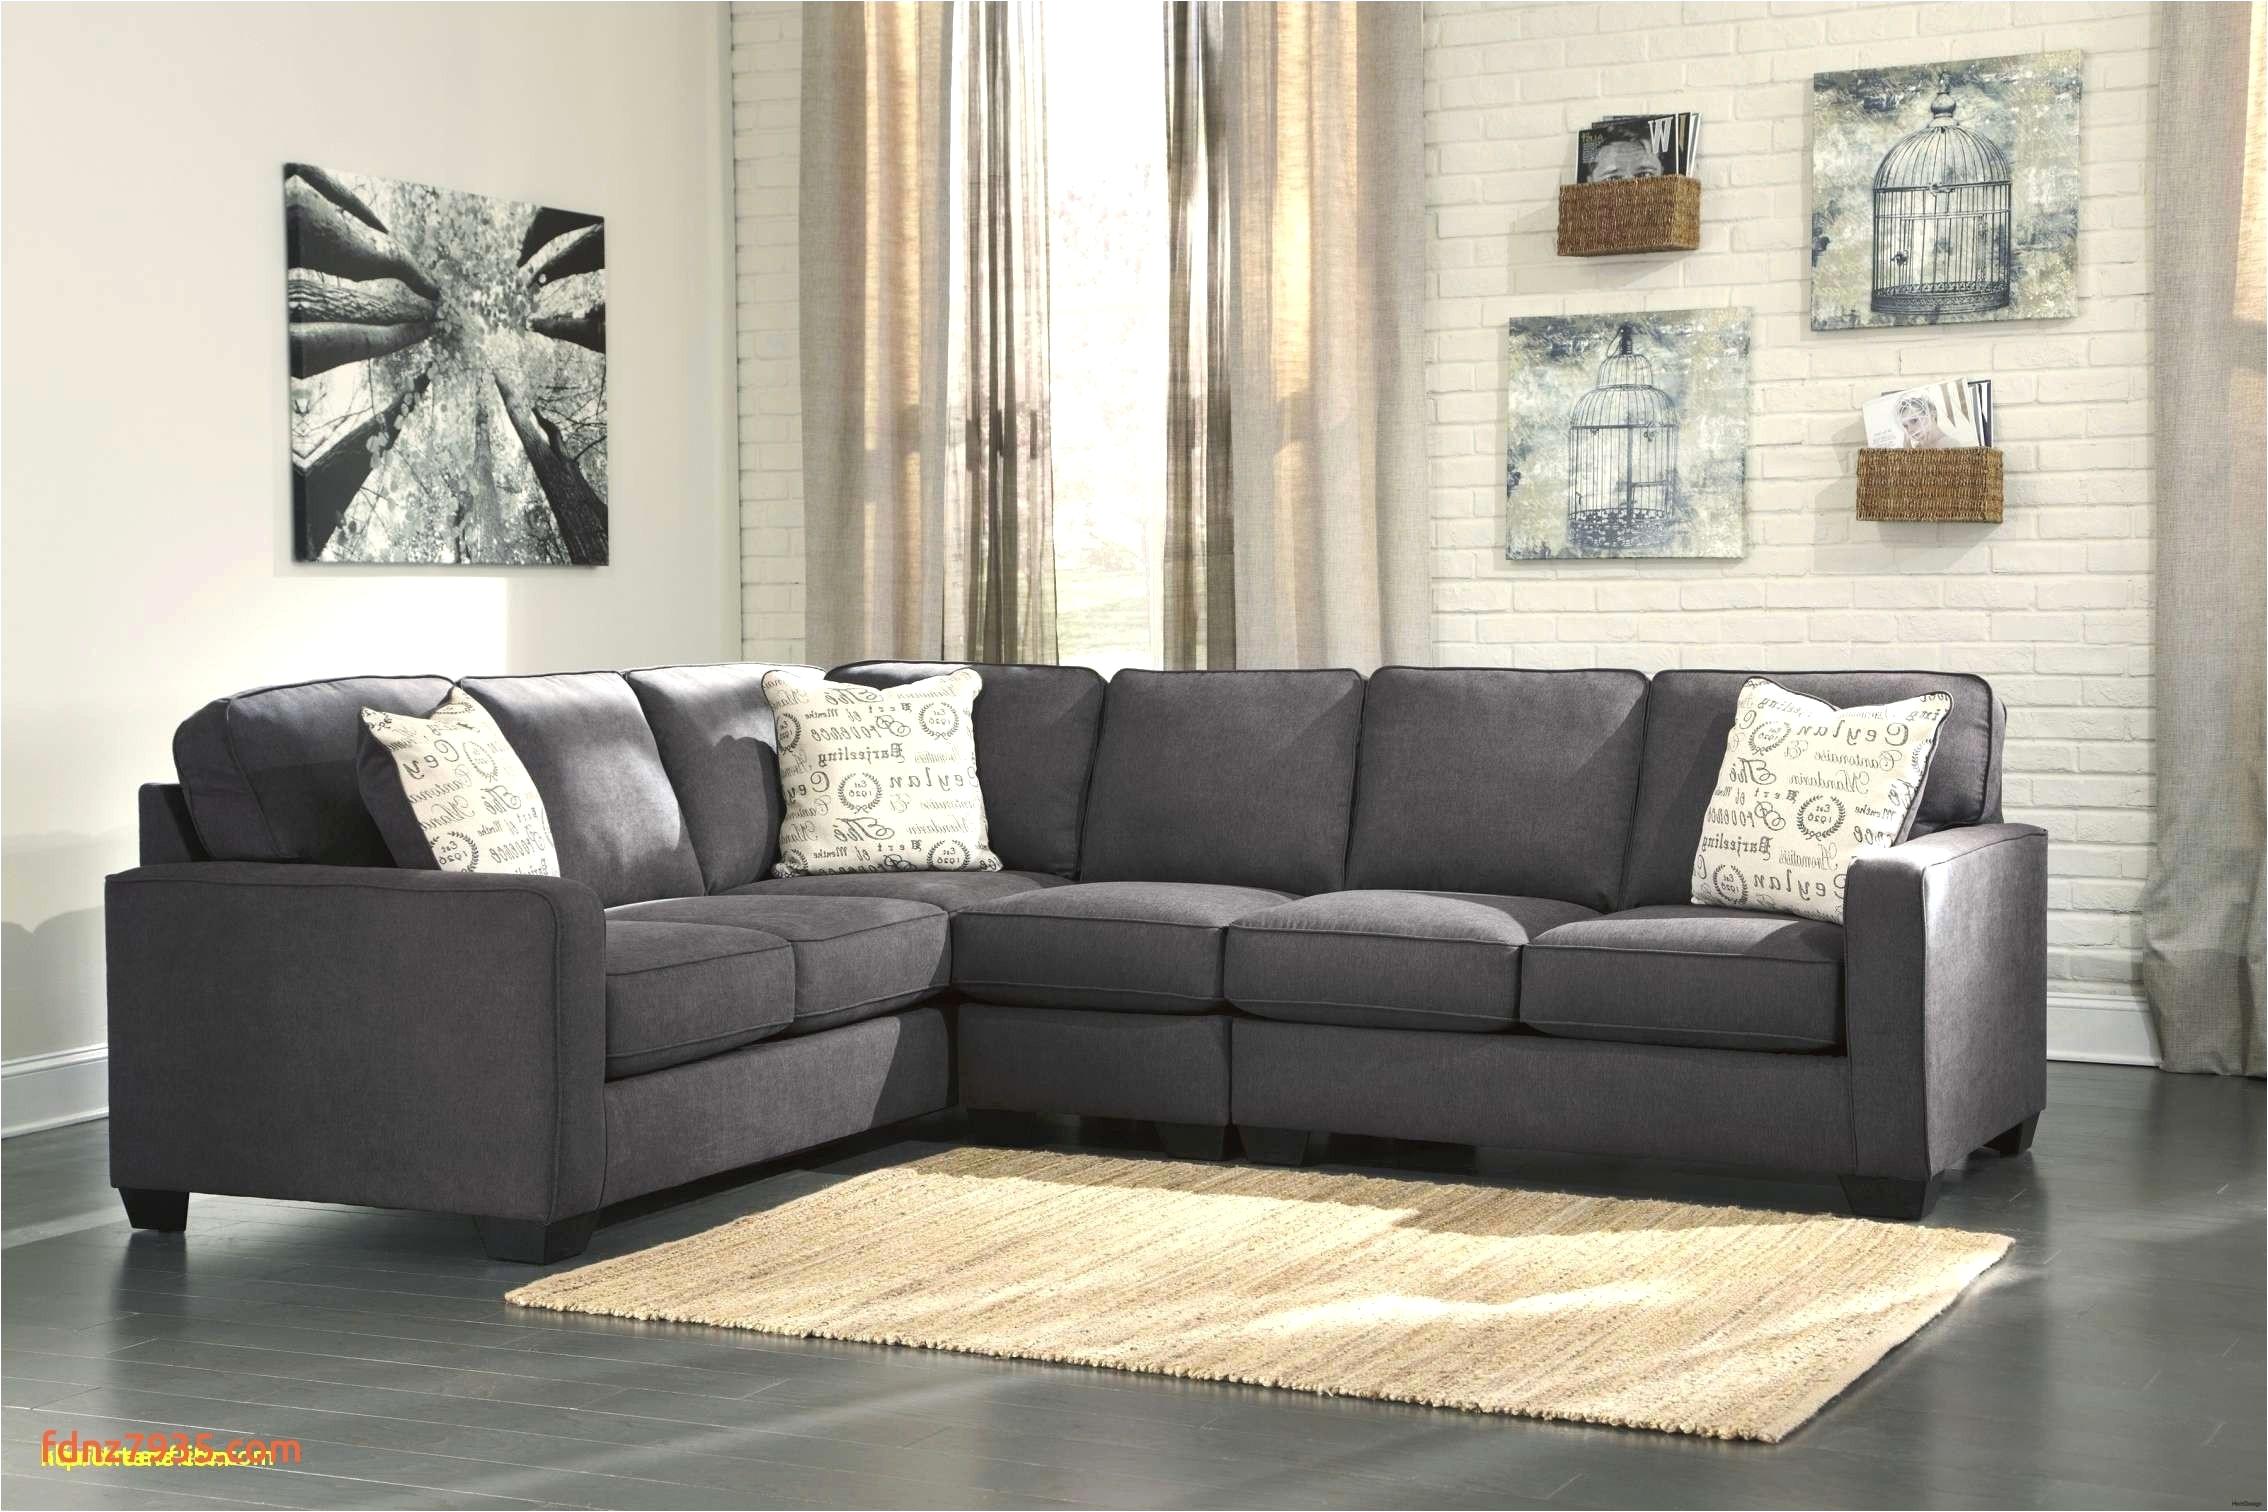 ashley furniture sectional sofa fresh sofa design